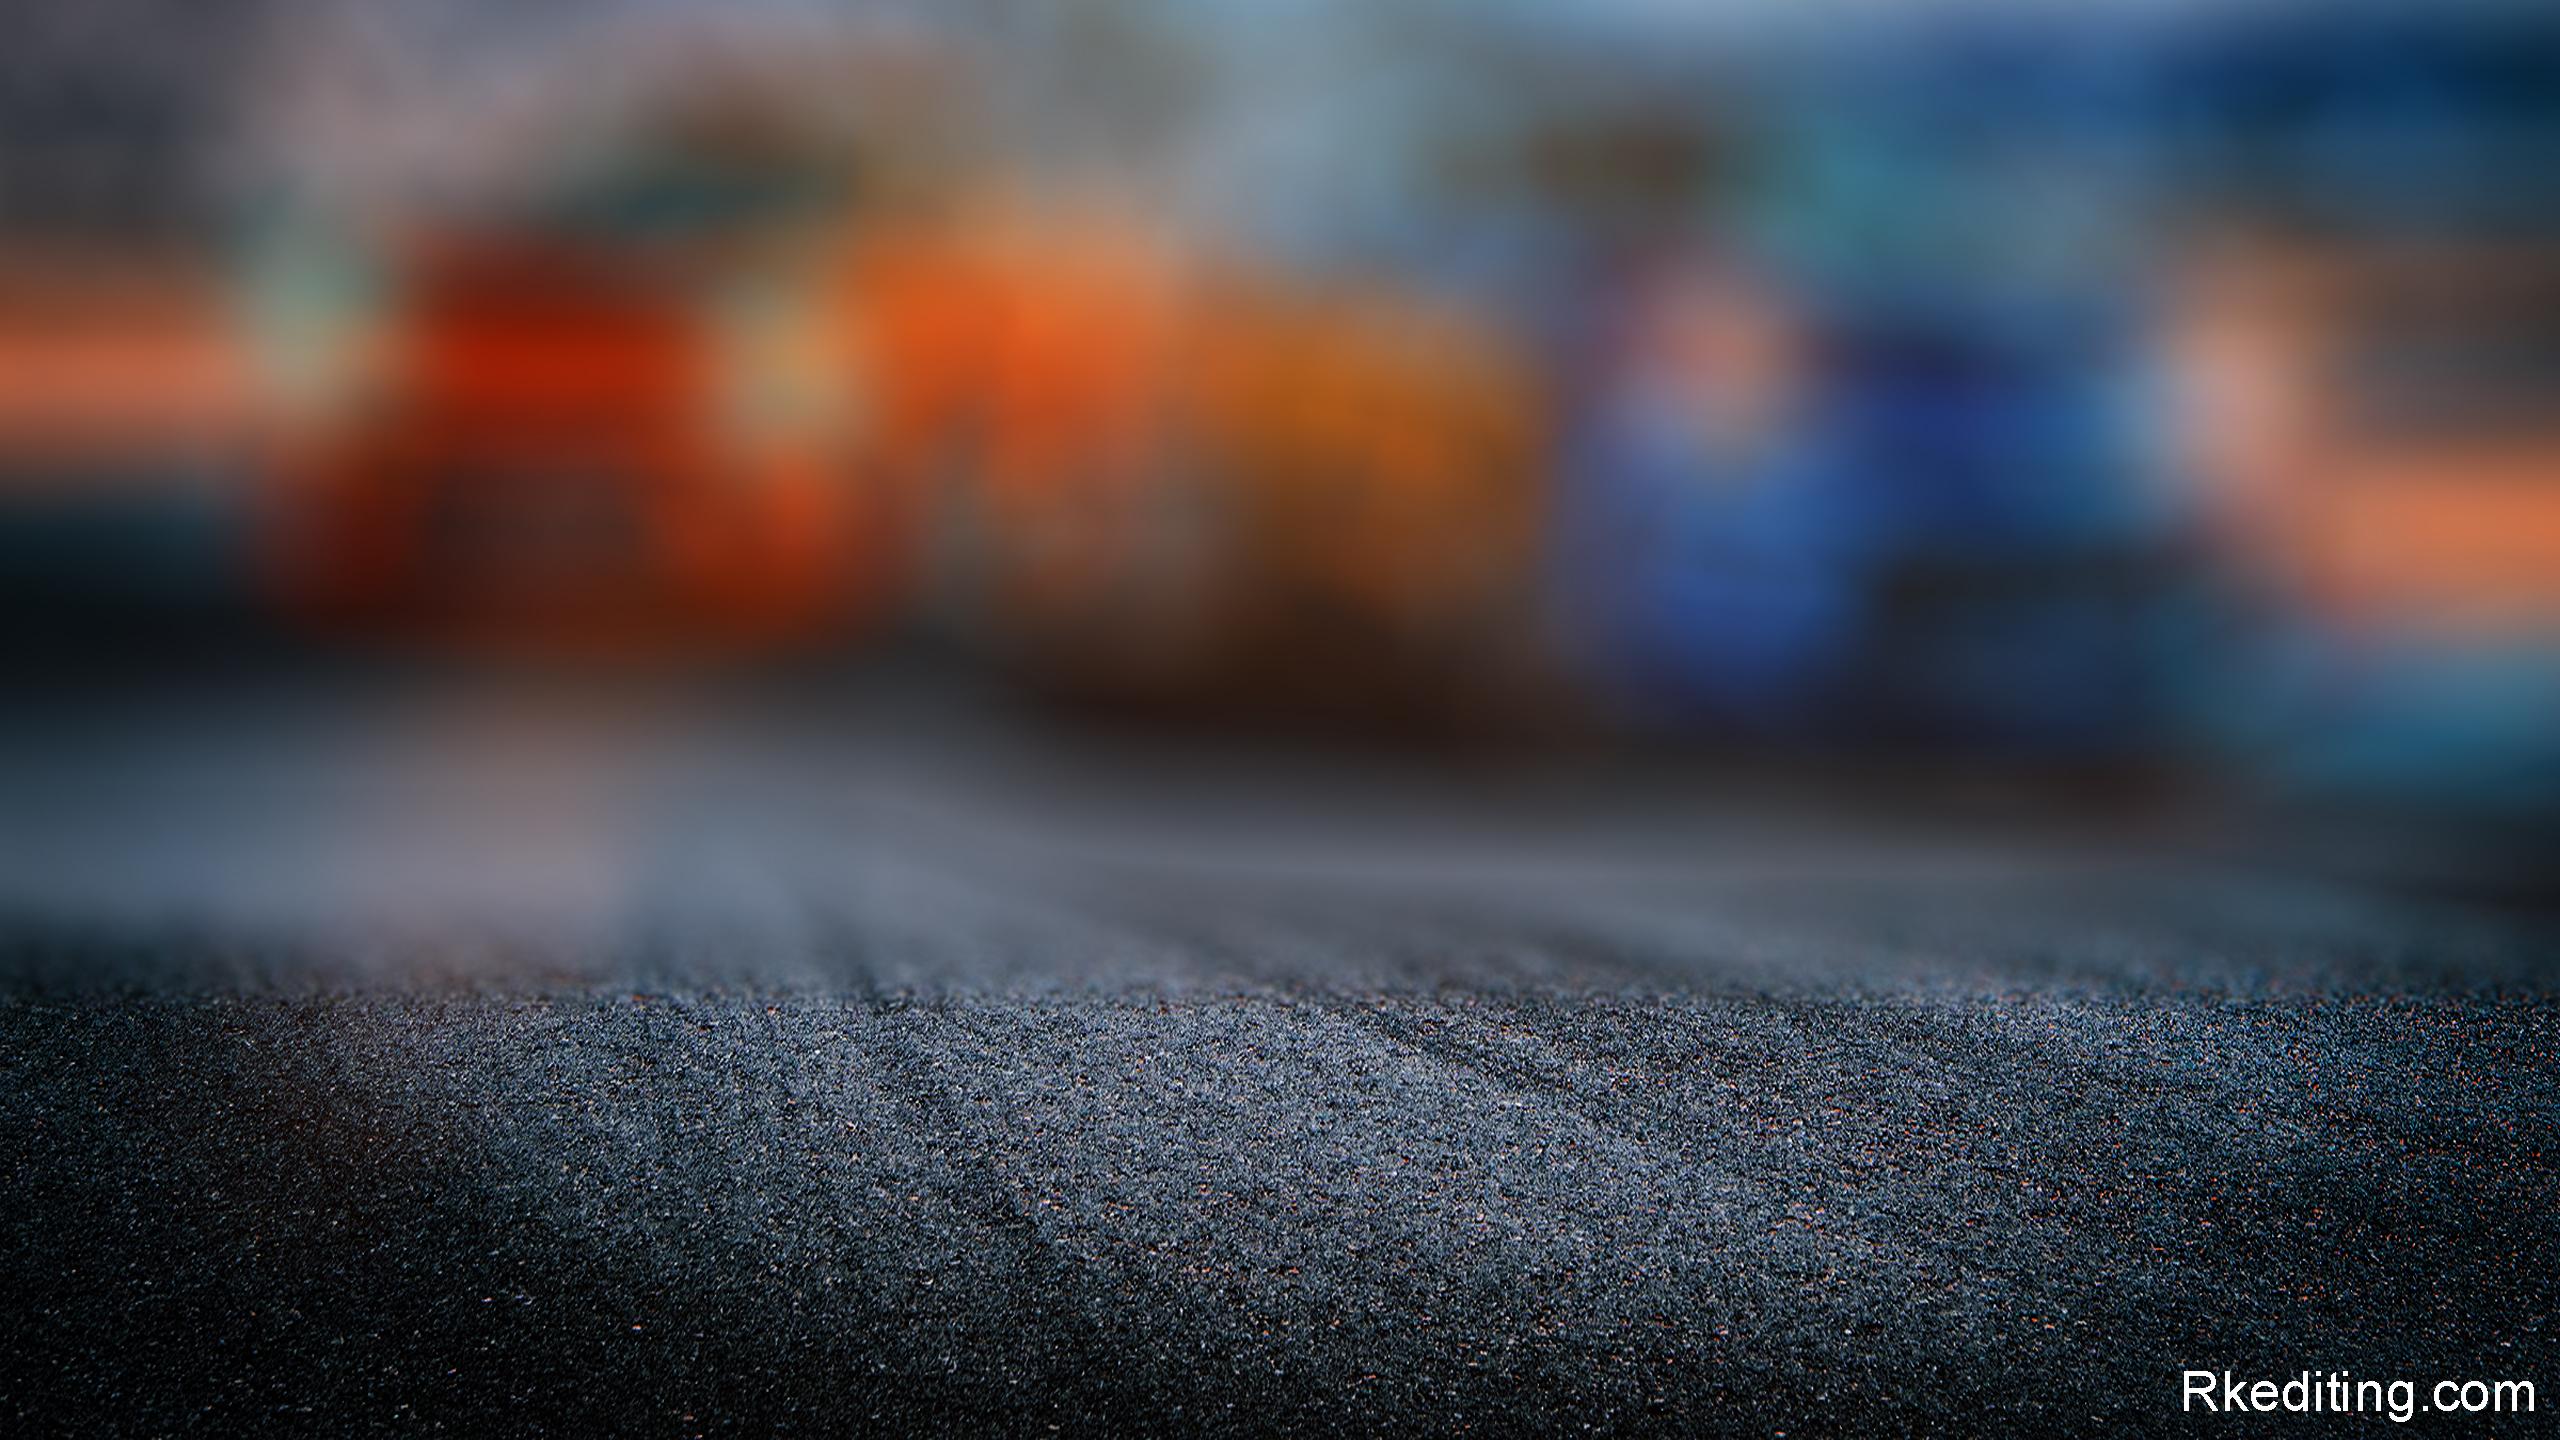 Picsart Background Hd Zip File Download ✓ The Best HD Wallpaper